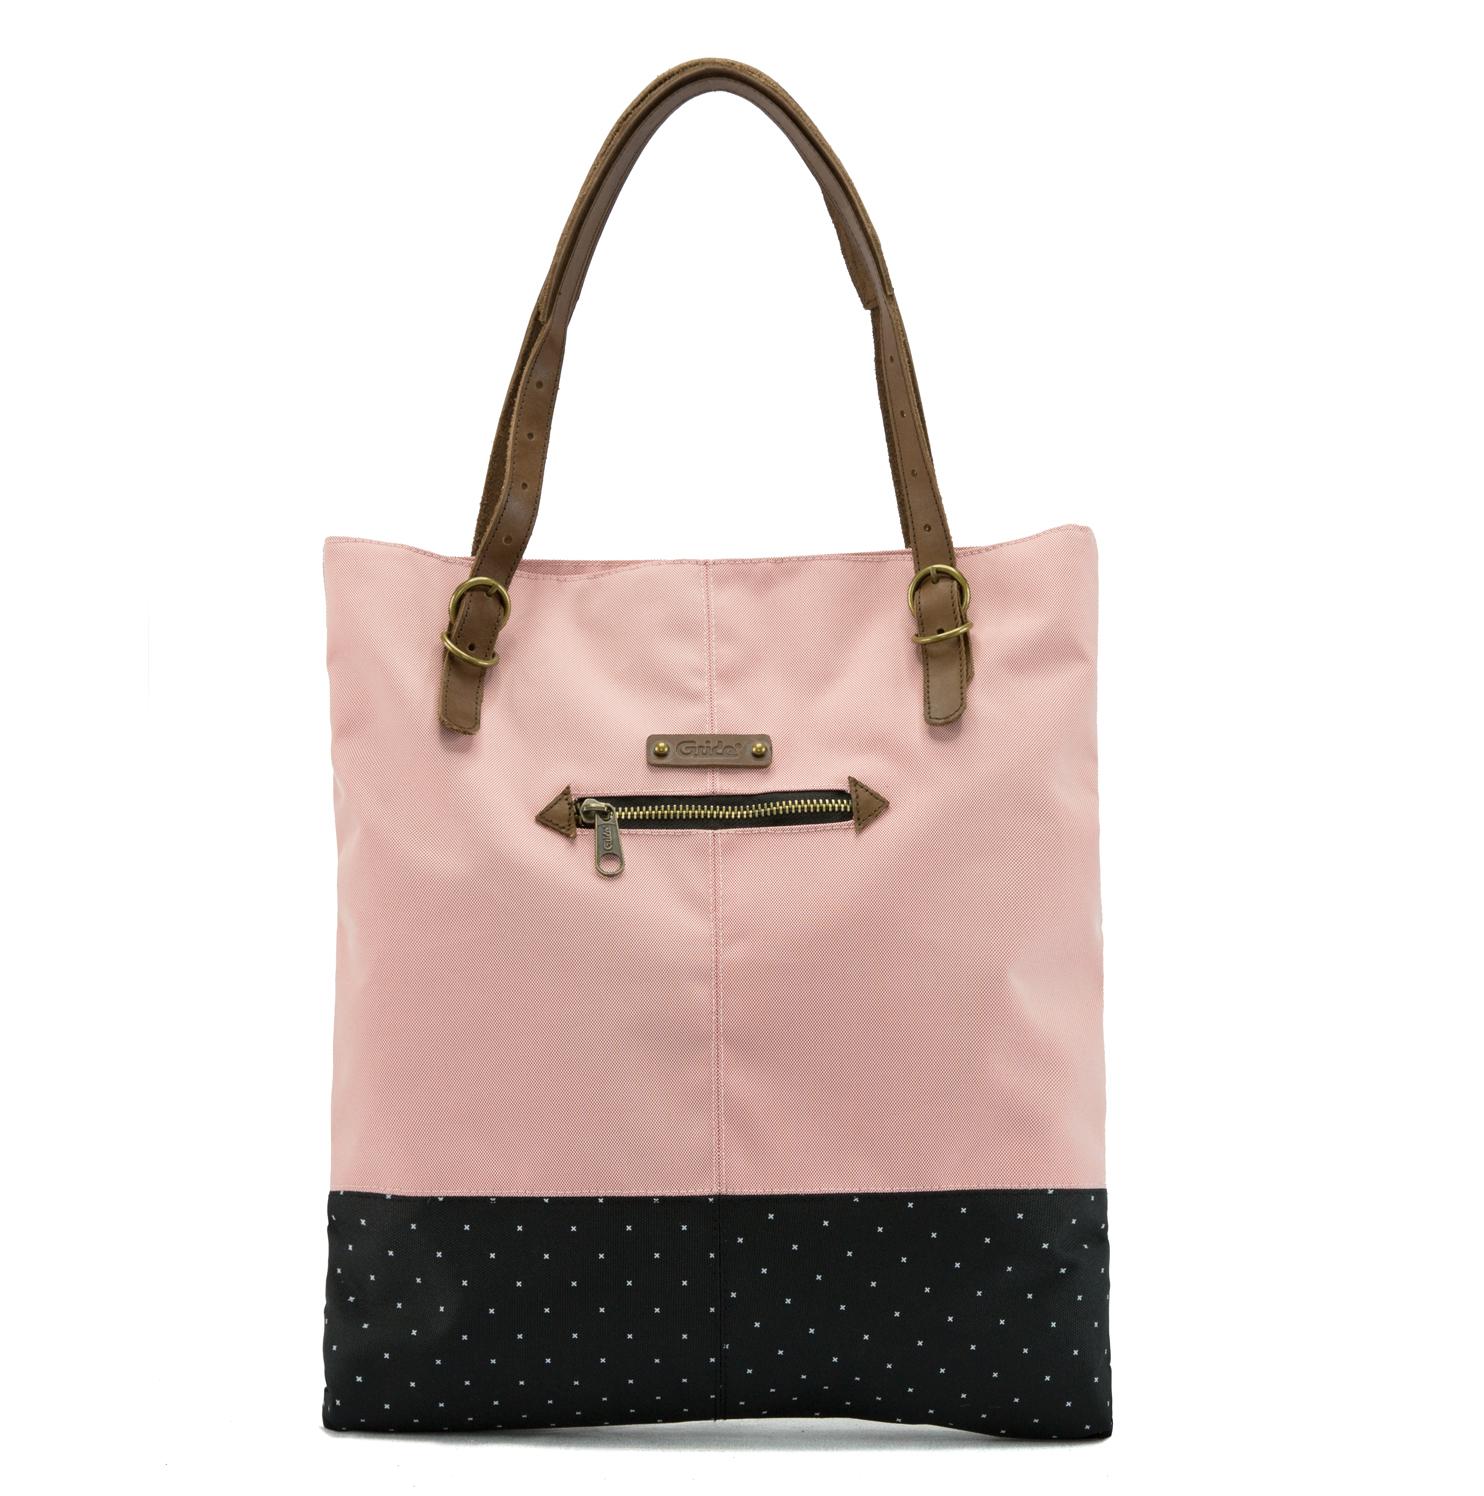 G.RIDE – Γυναικεία τσάντα G.Ride ροζ 1516515.0-7345